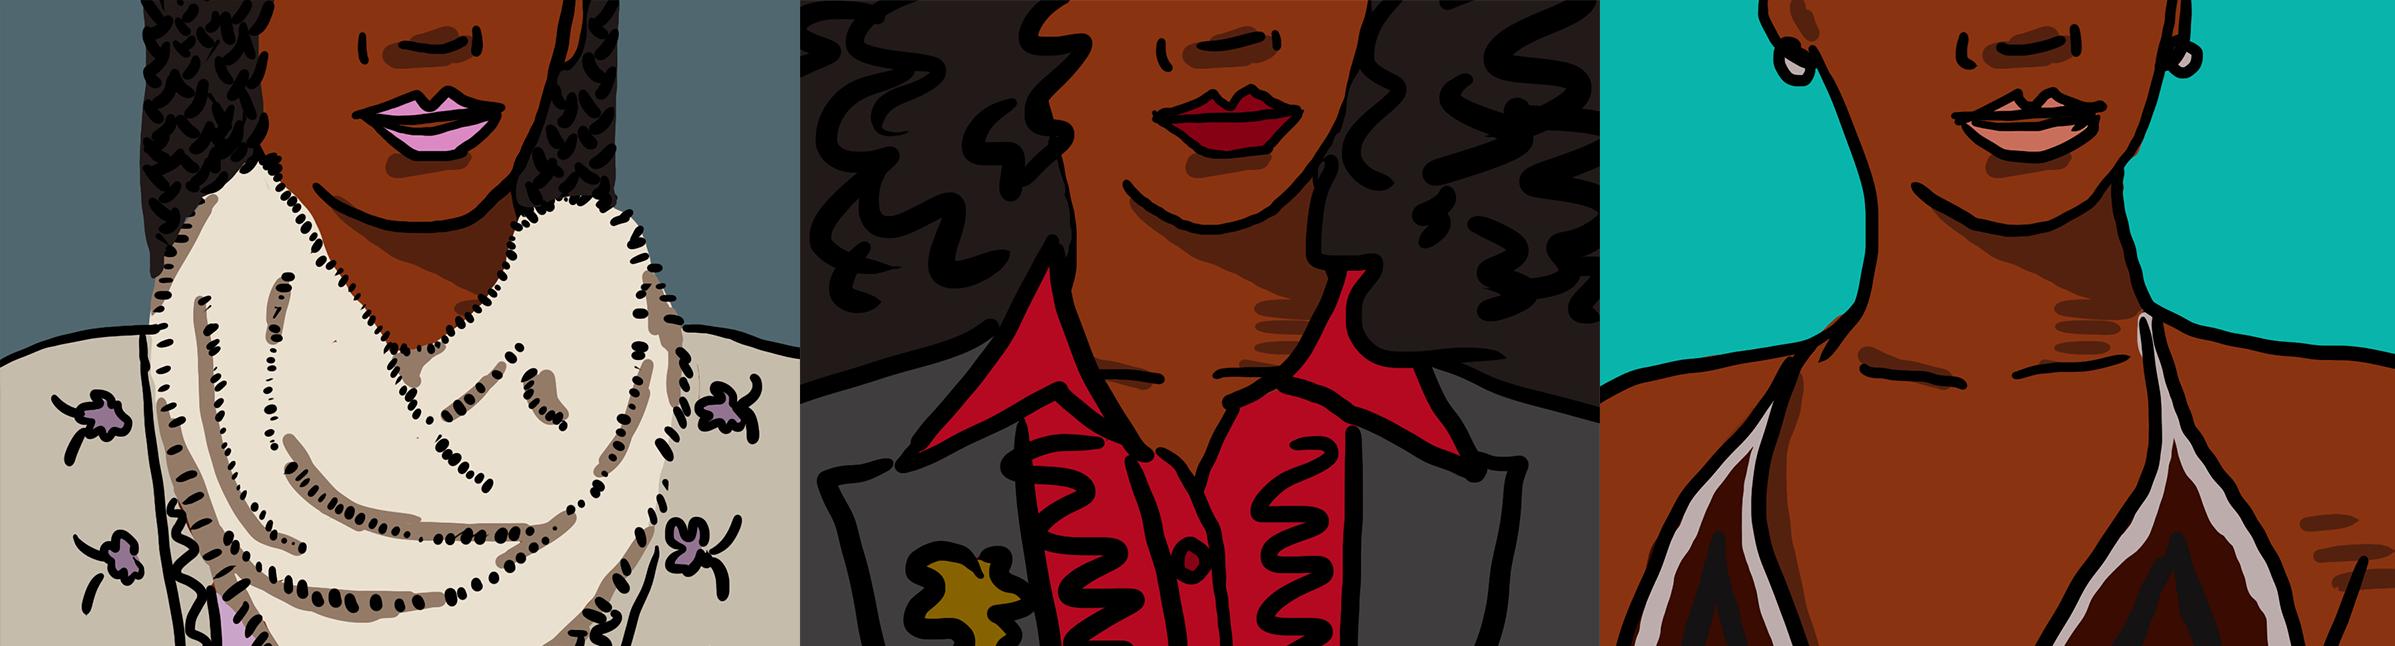 visual-identity-illustration.png